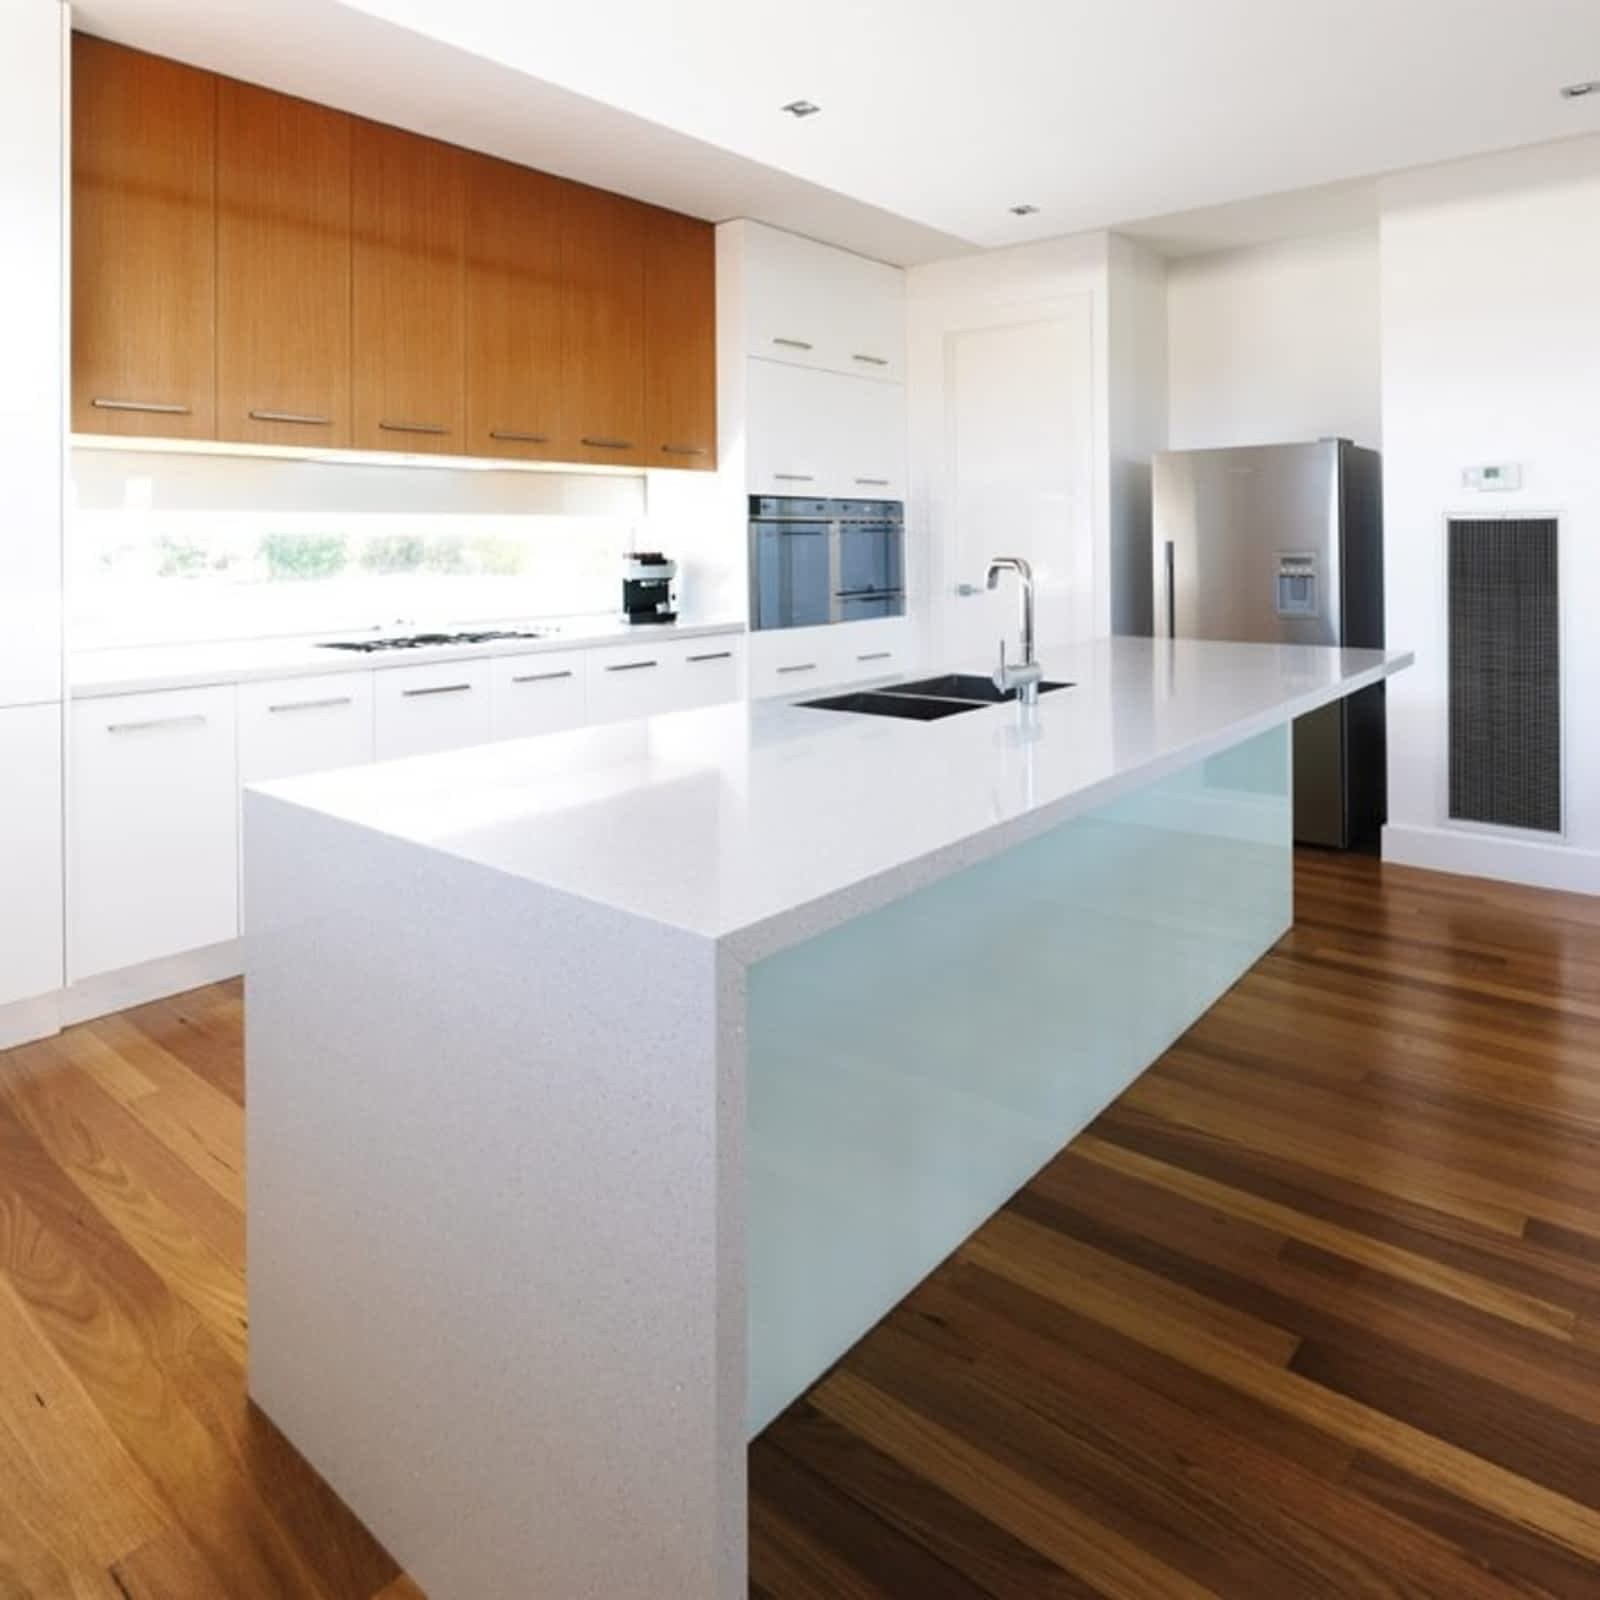 chicago countertops kitchen granite quartz tops cabinets and